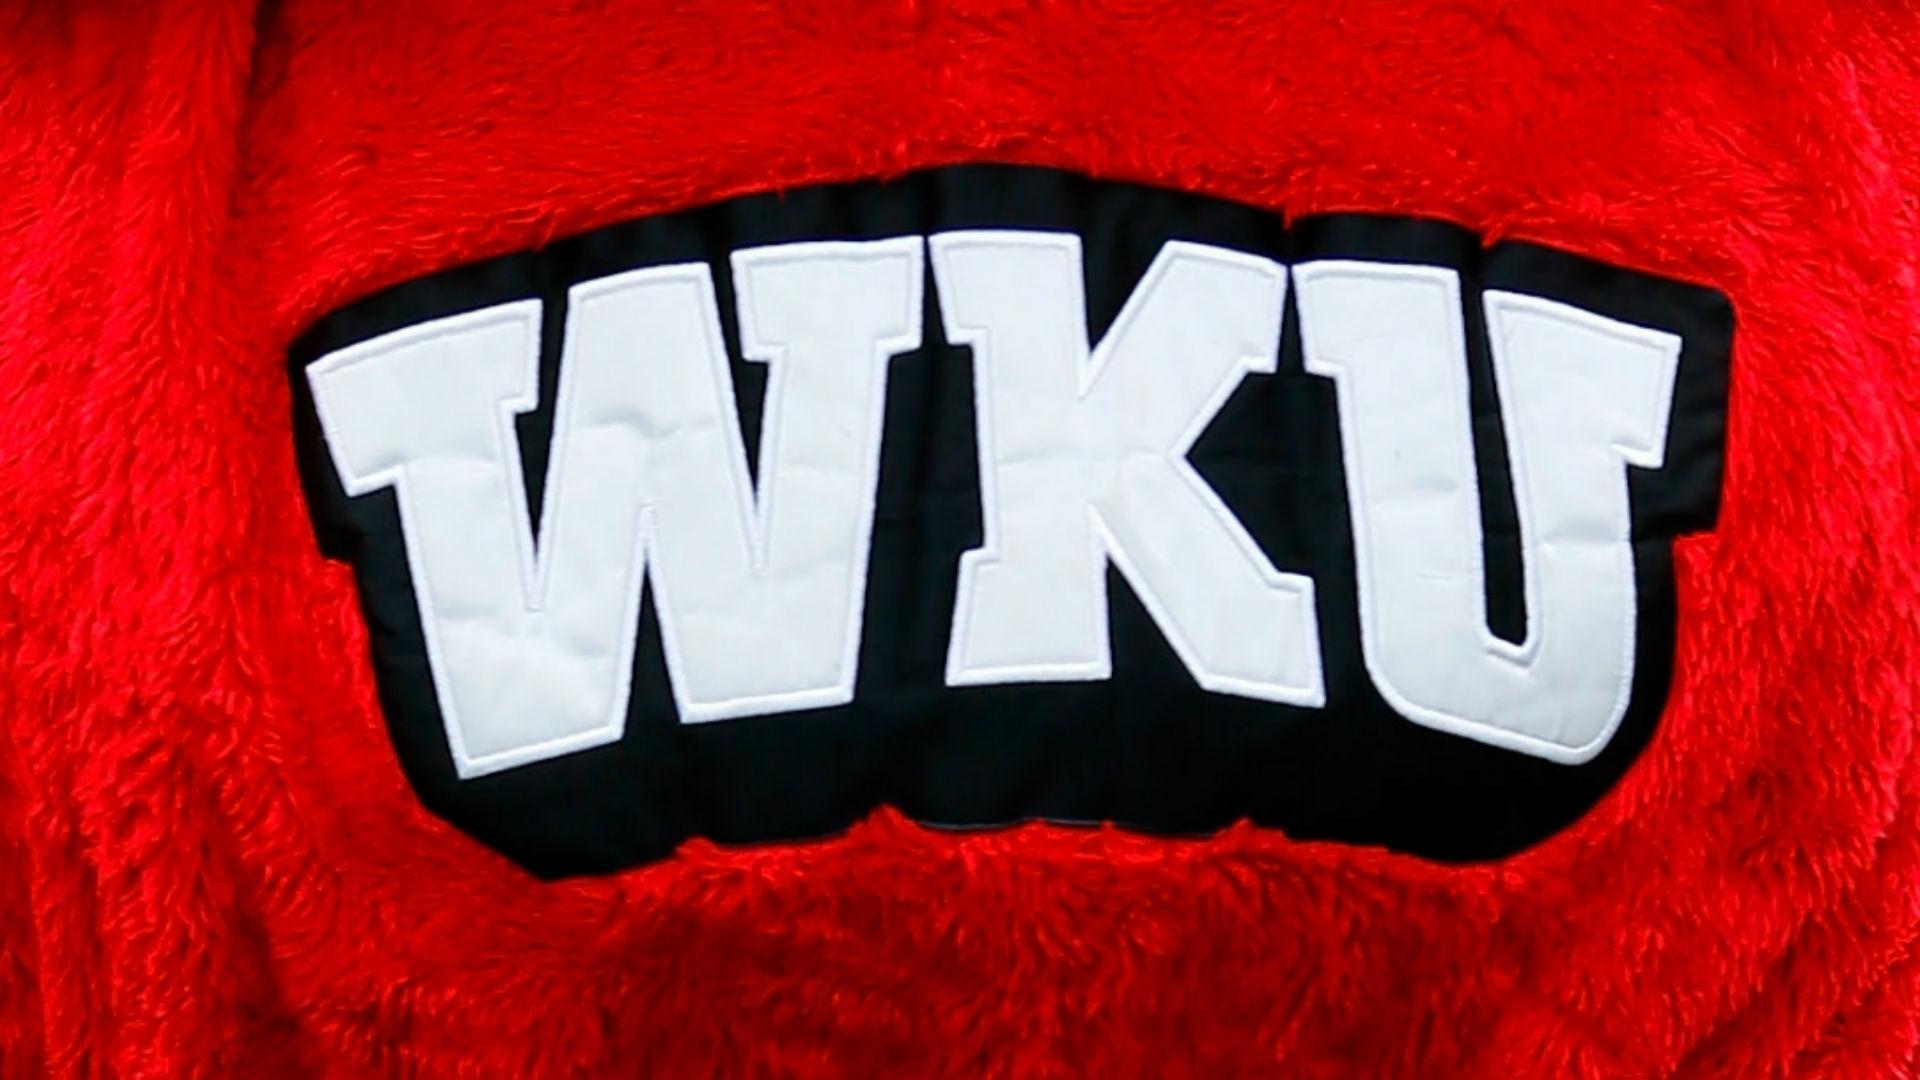 Wku-logo_t50iapdu2tqz1wz7iqub659lz